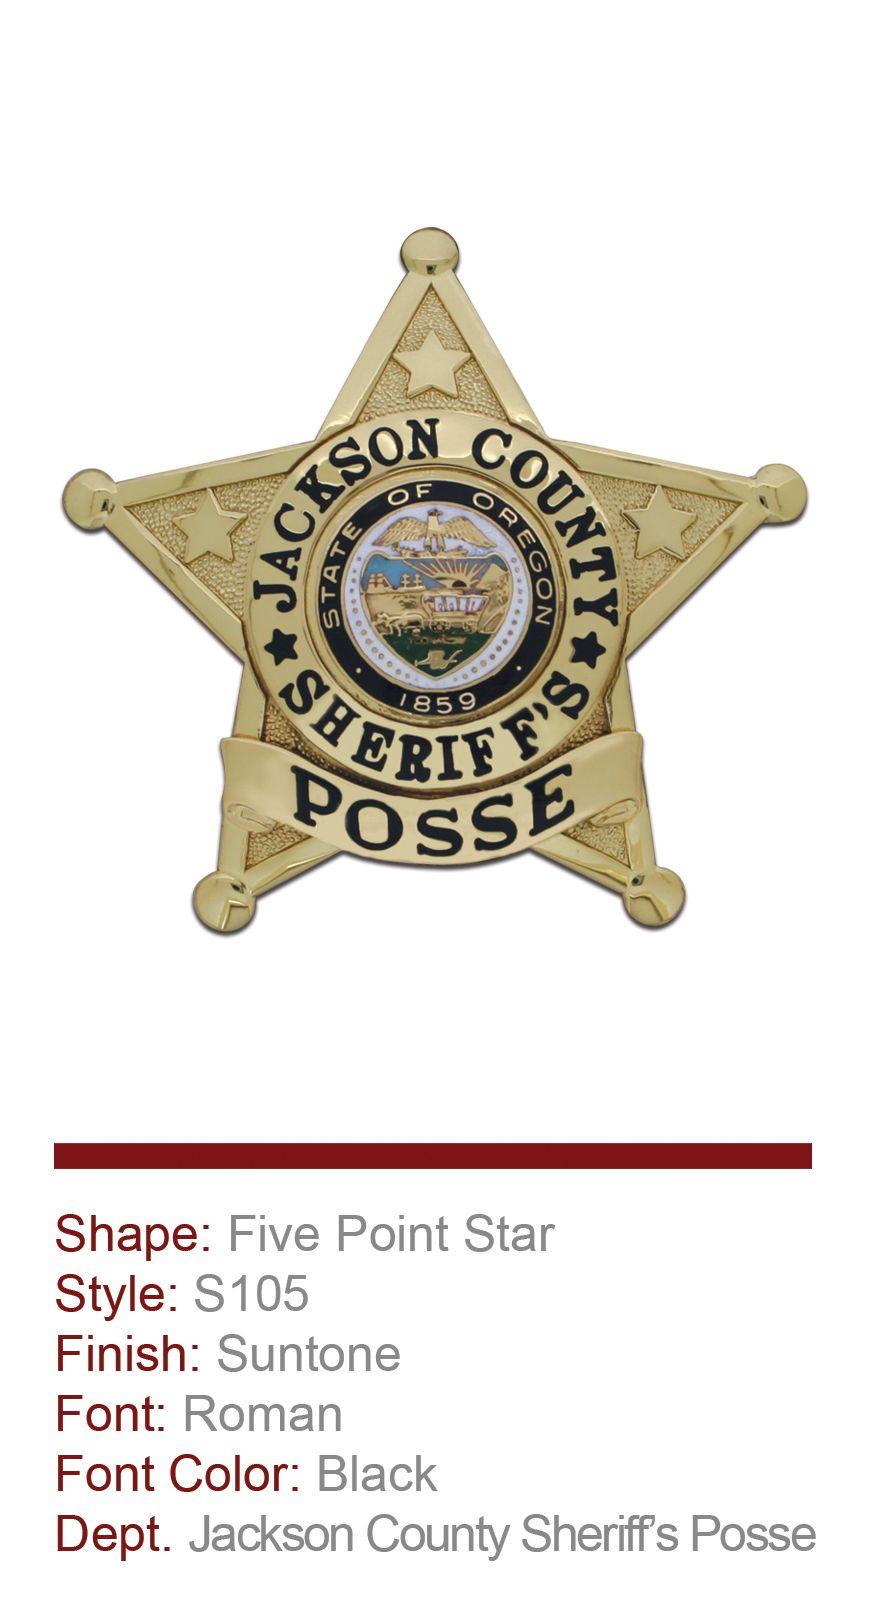 Jacksonville County Sheriff's Posse